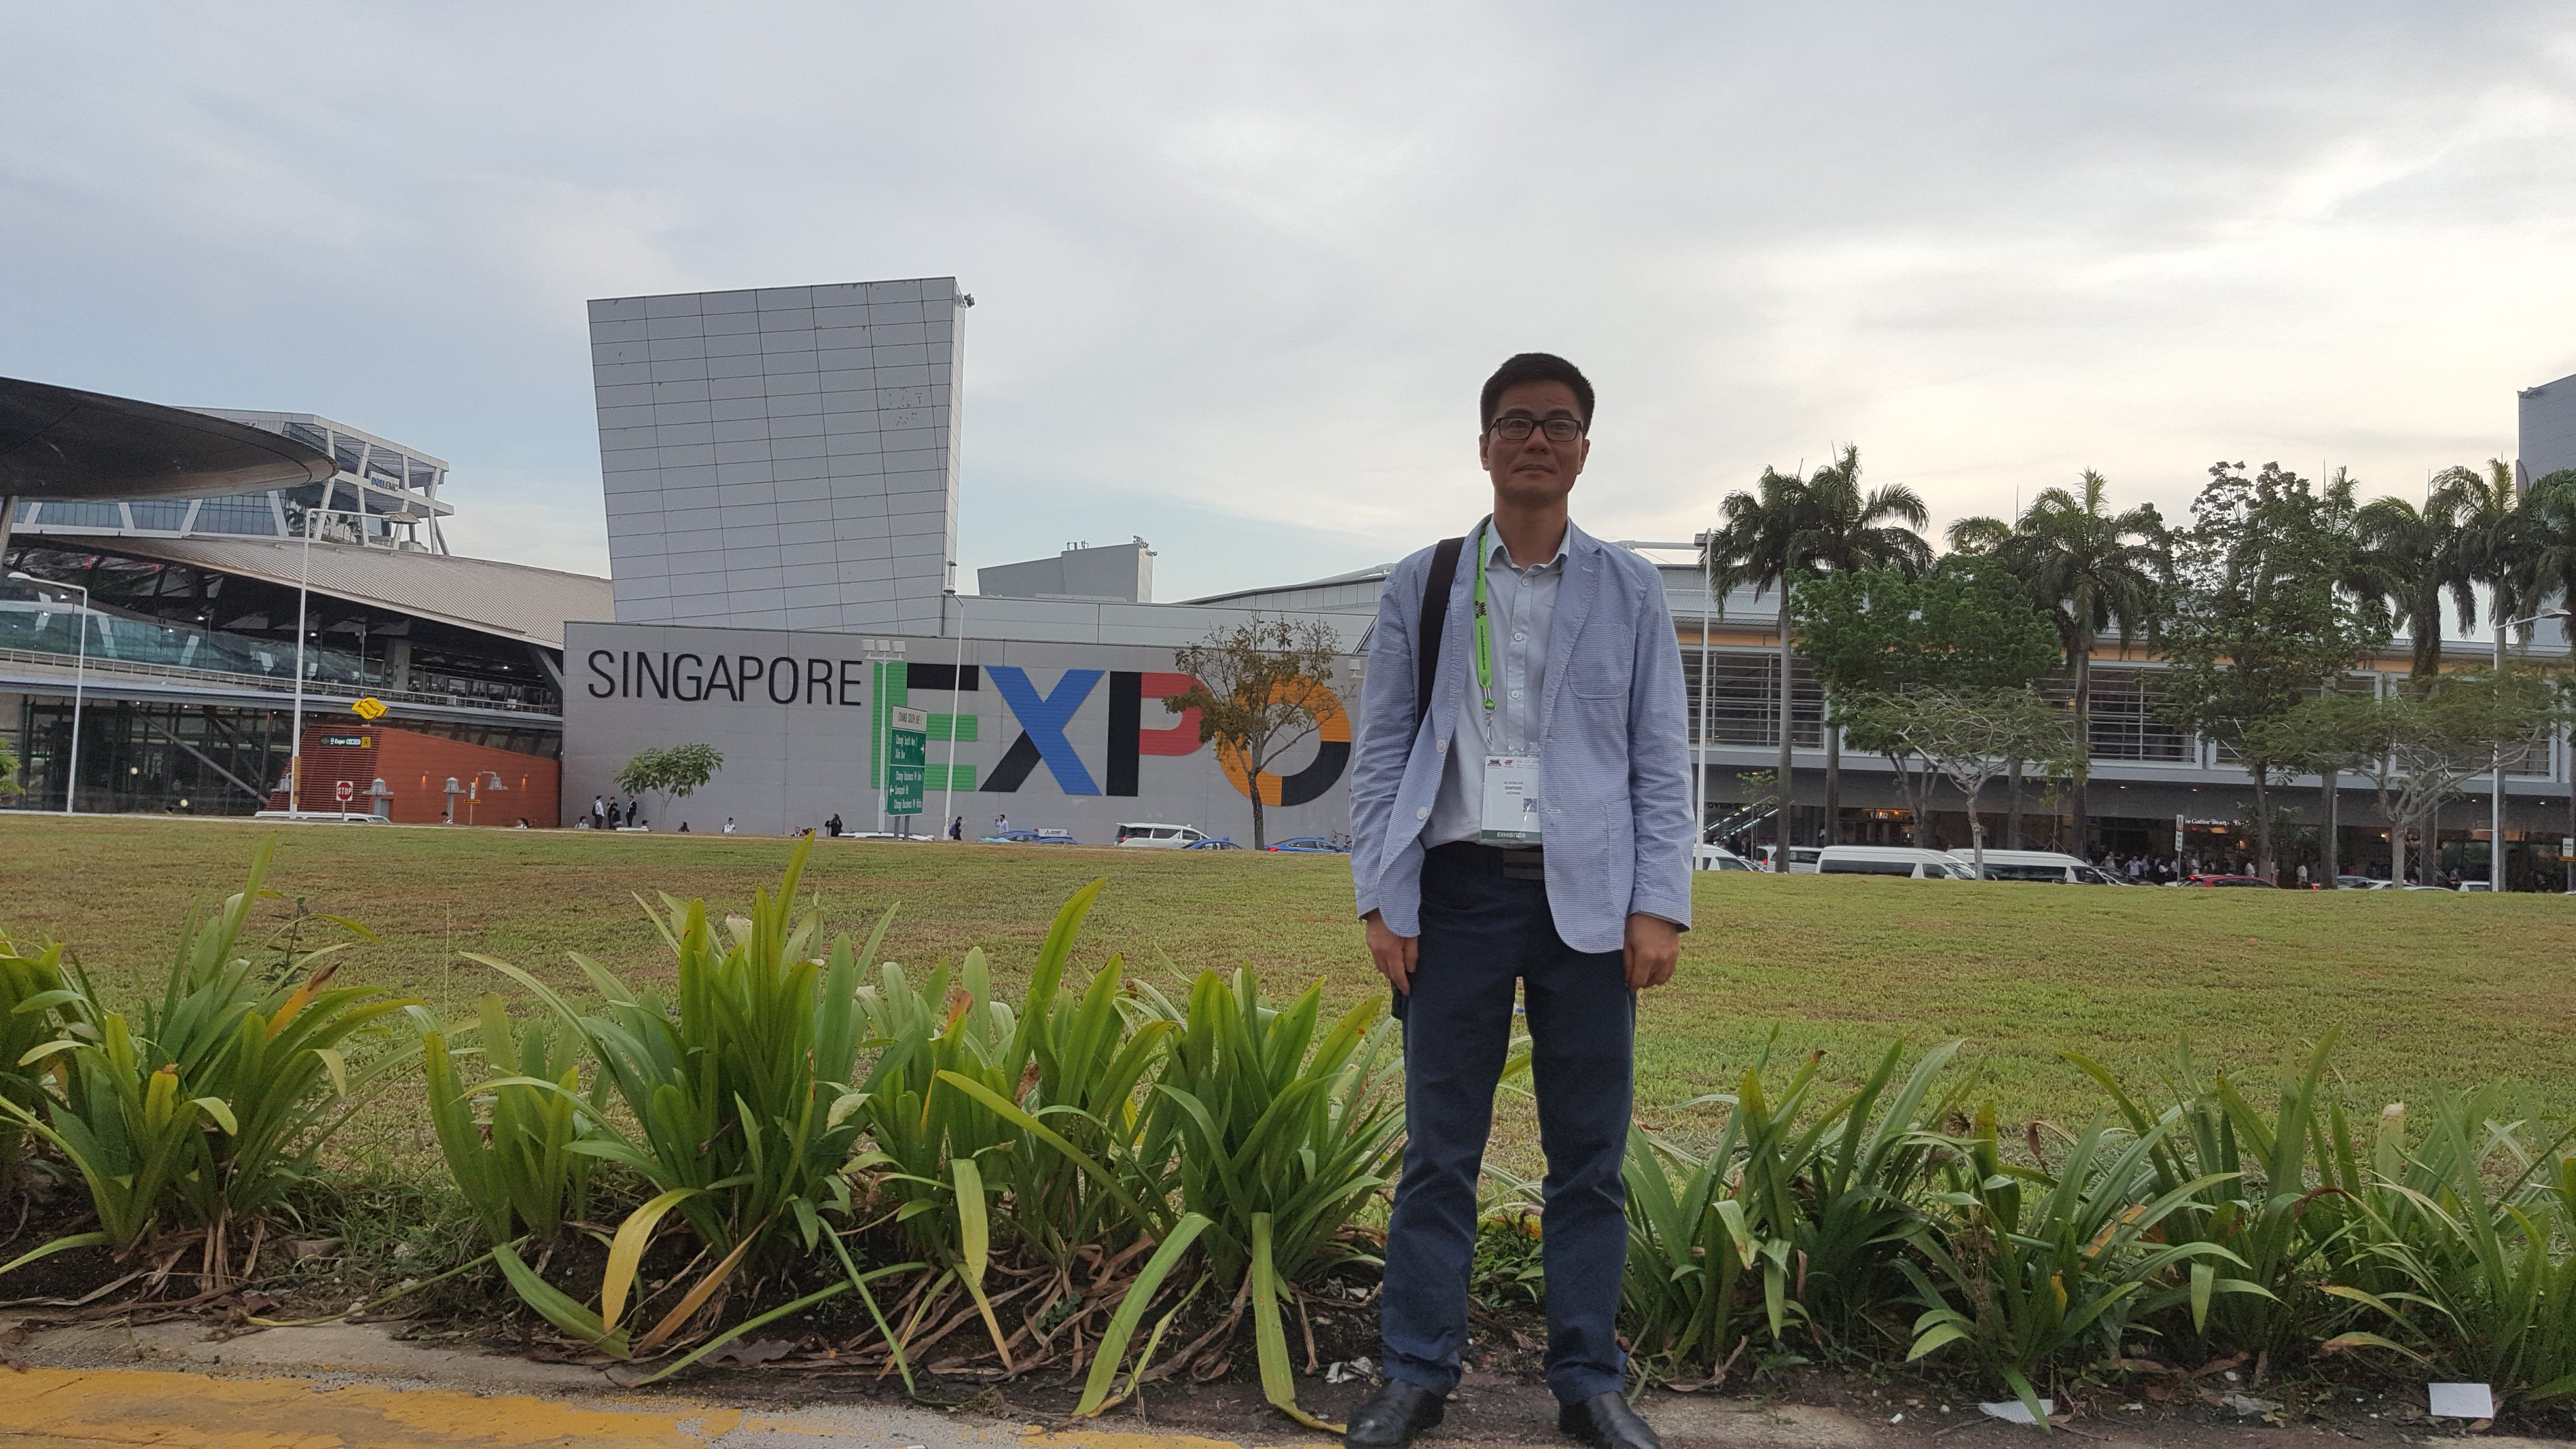 Singapore Expo 2016